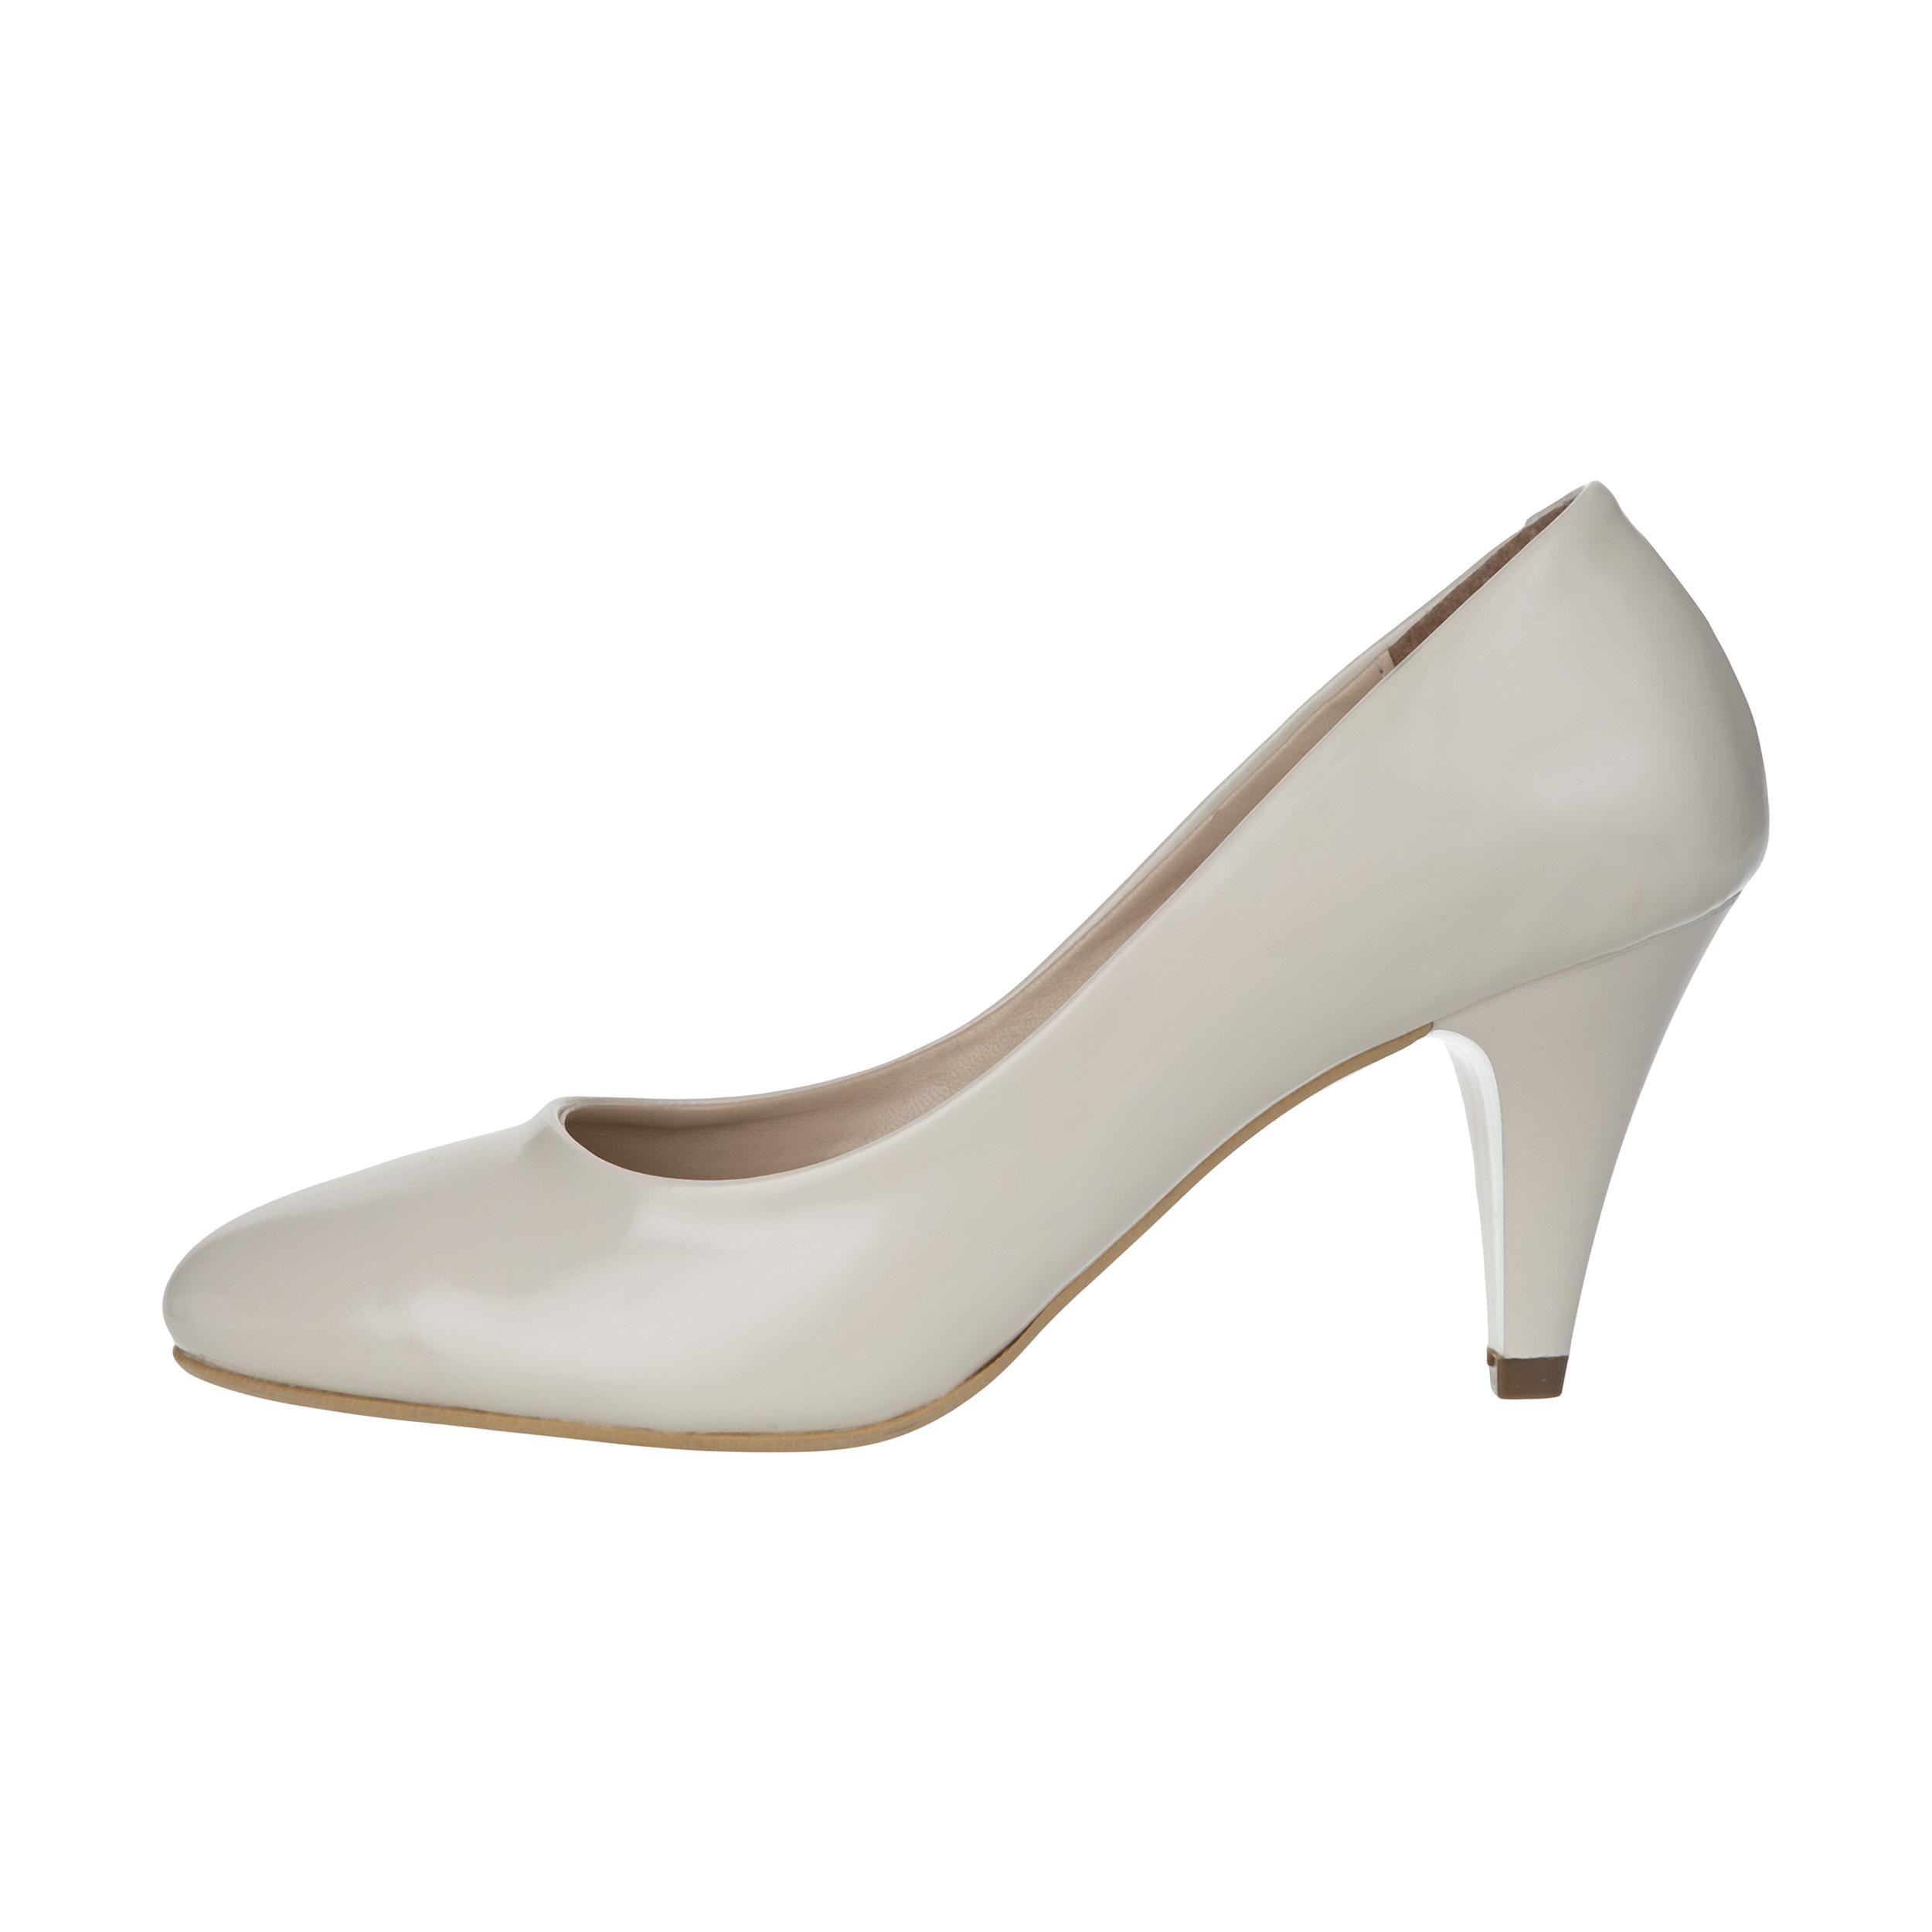 کفش زنانه پولاریس مدل 100245226-105